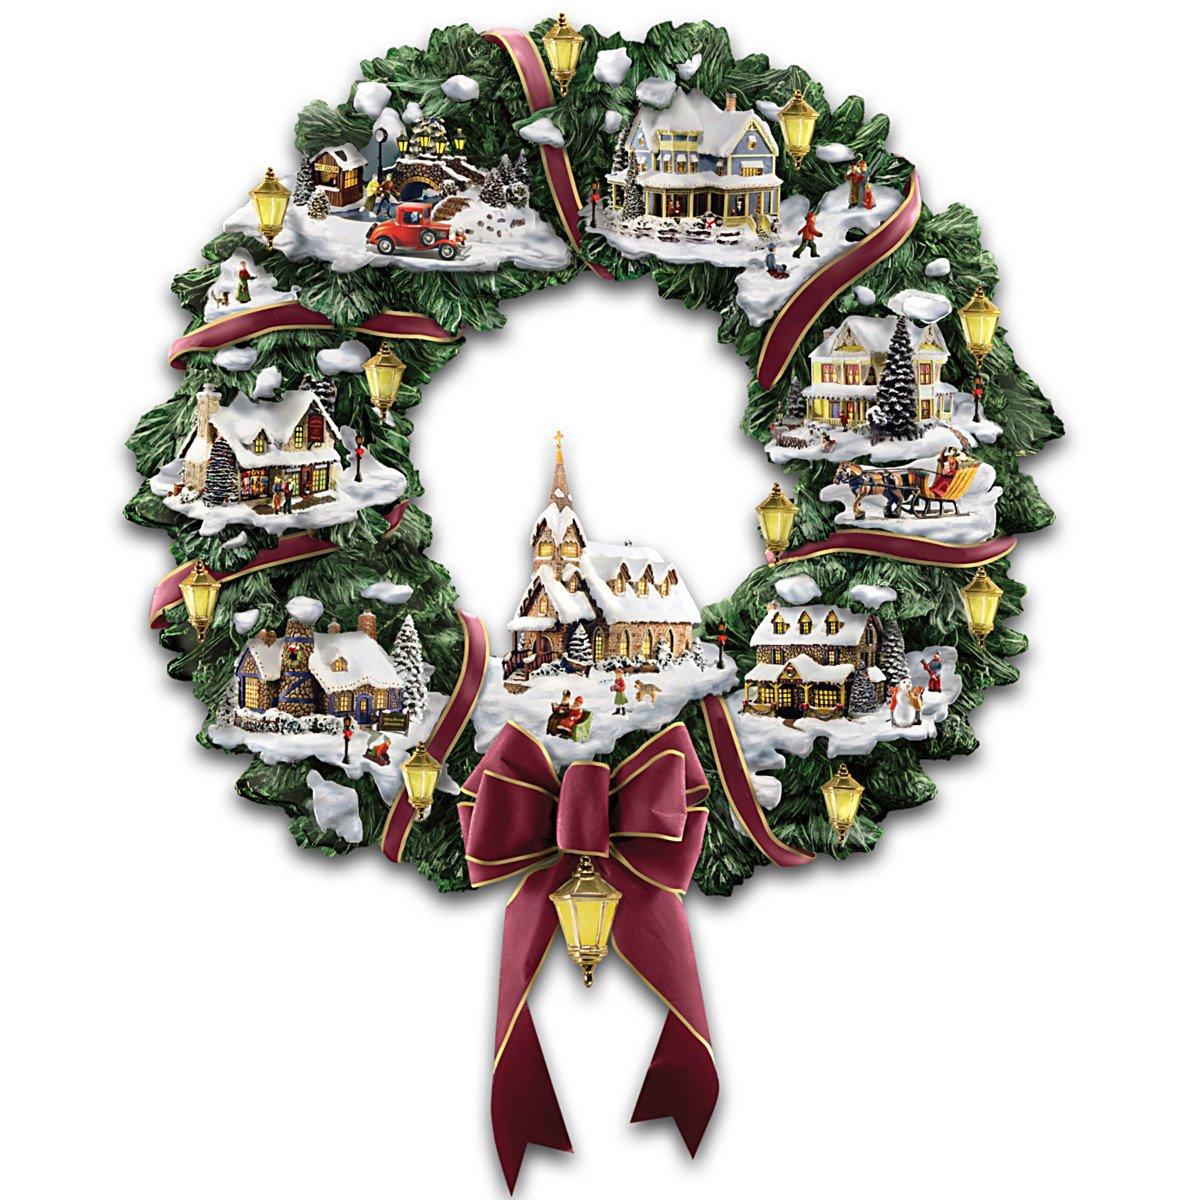 Thomas Kinkade Victorian Christmas Village Wreath by The Hamilton Collection